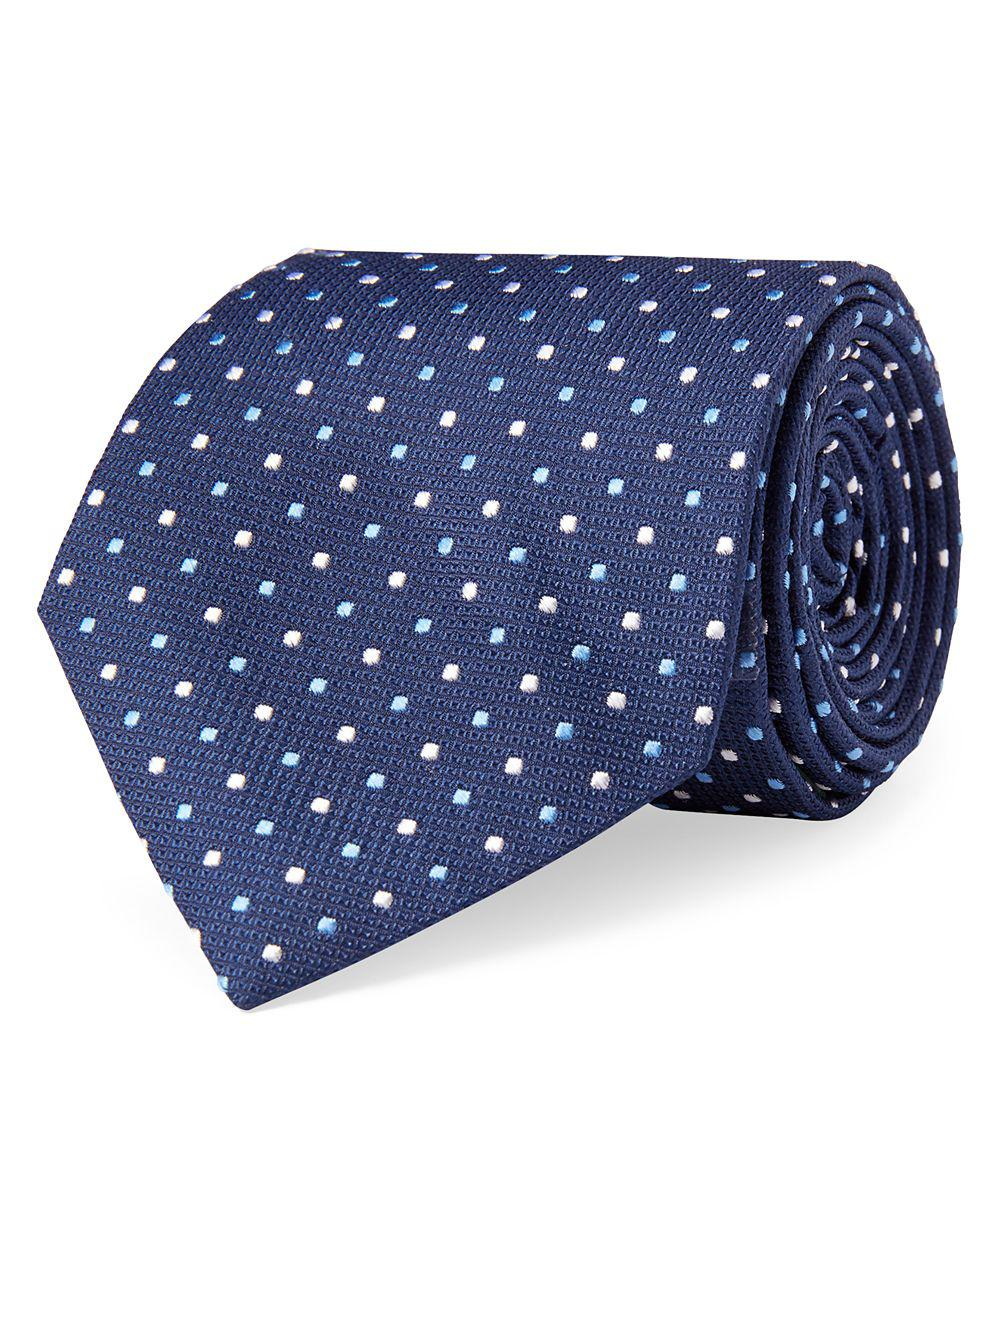 706cce63f09c Lauren By Ralph Lauren Multicolored Pin Dot Silk Tie in Blue for Men ...